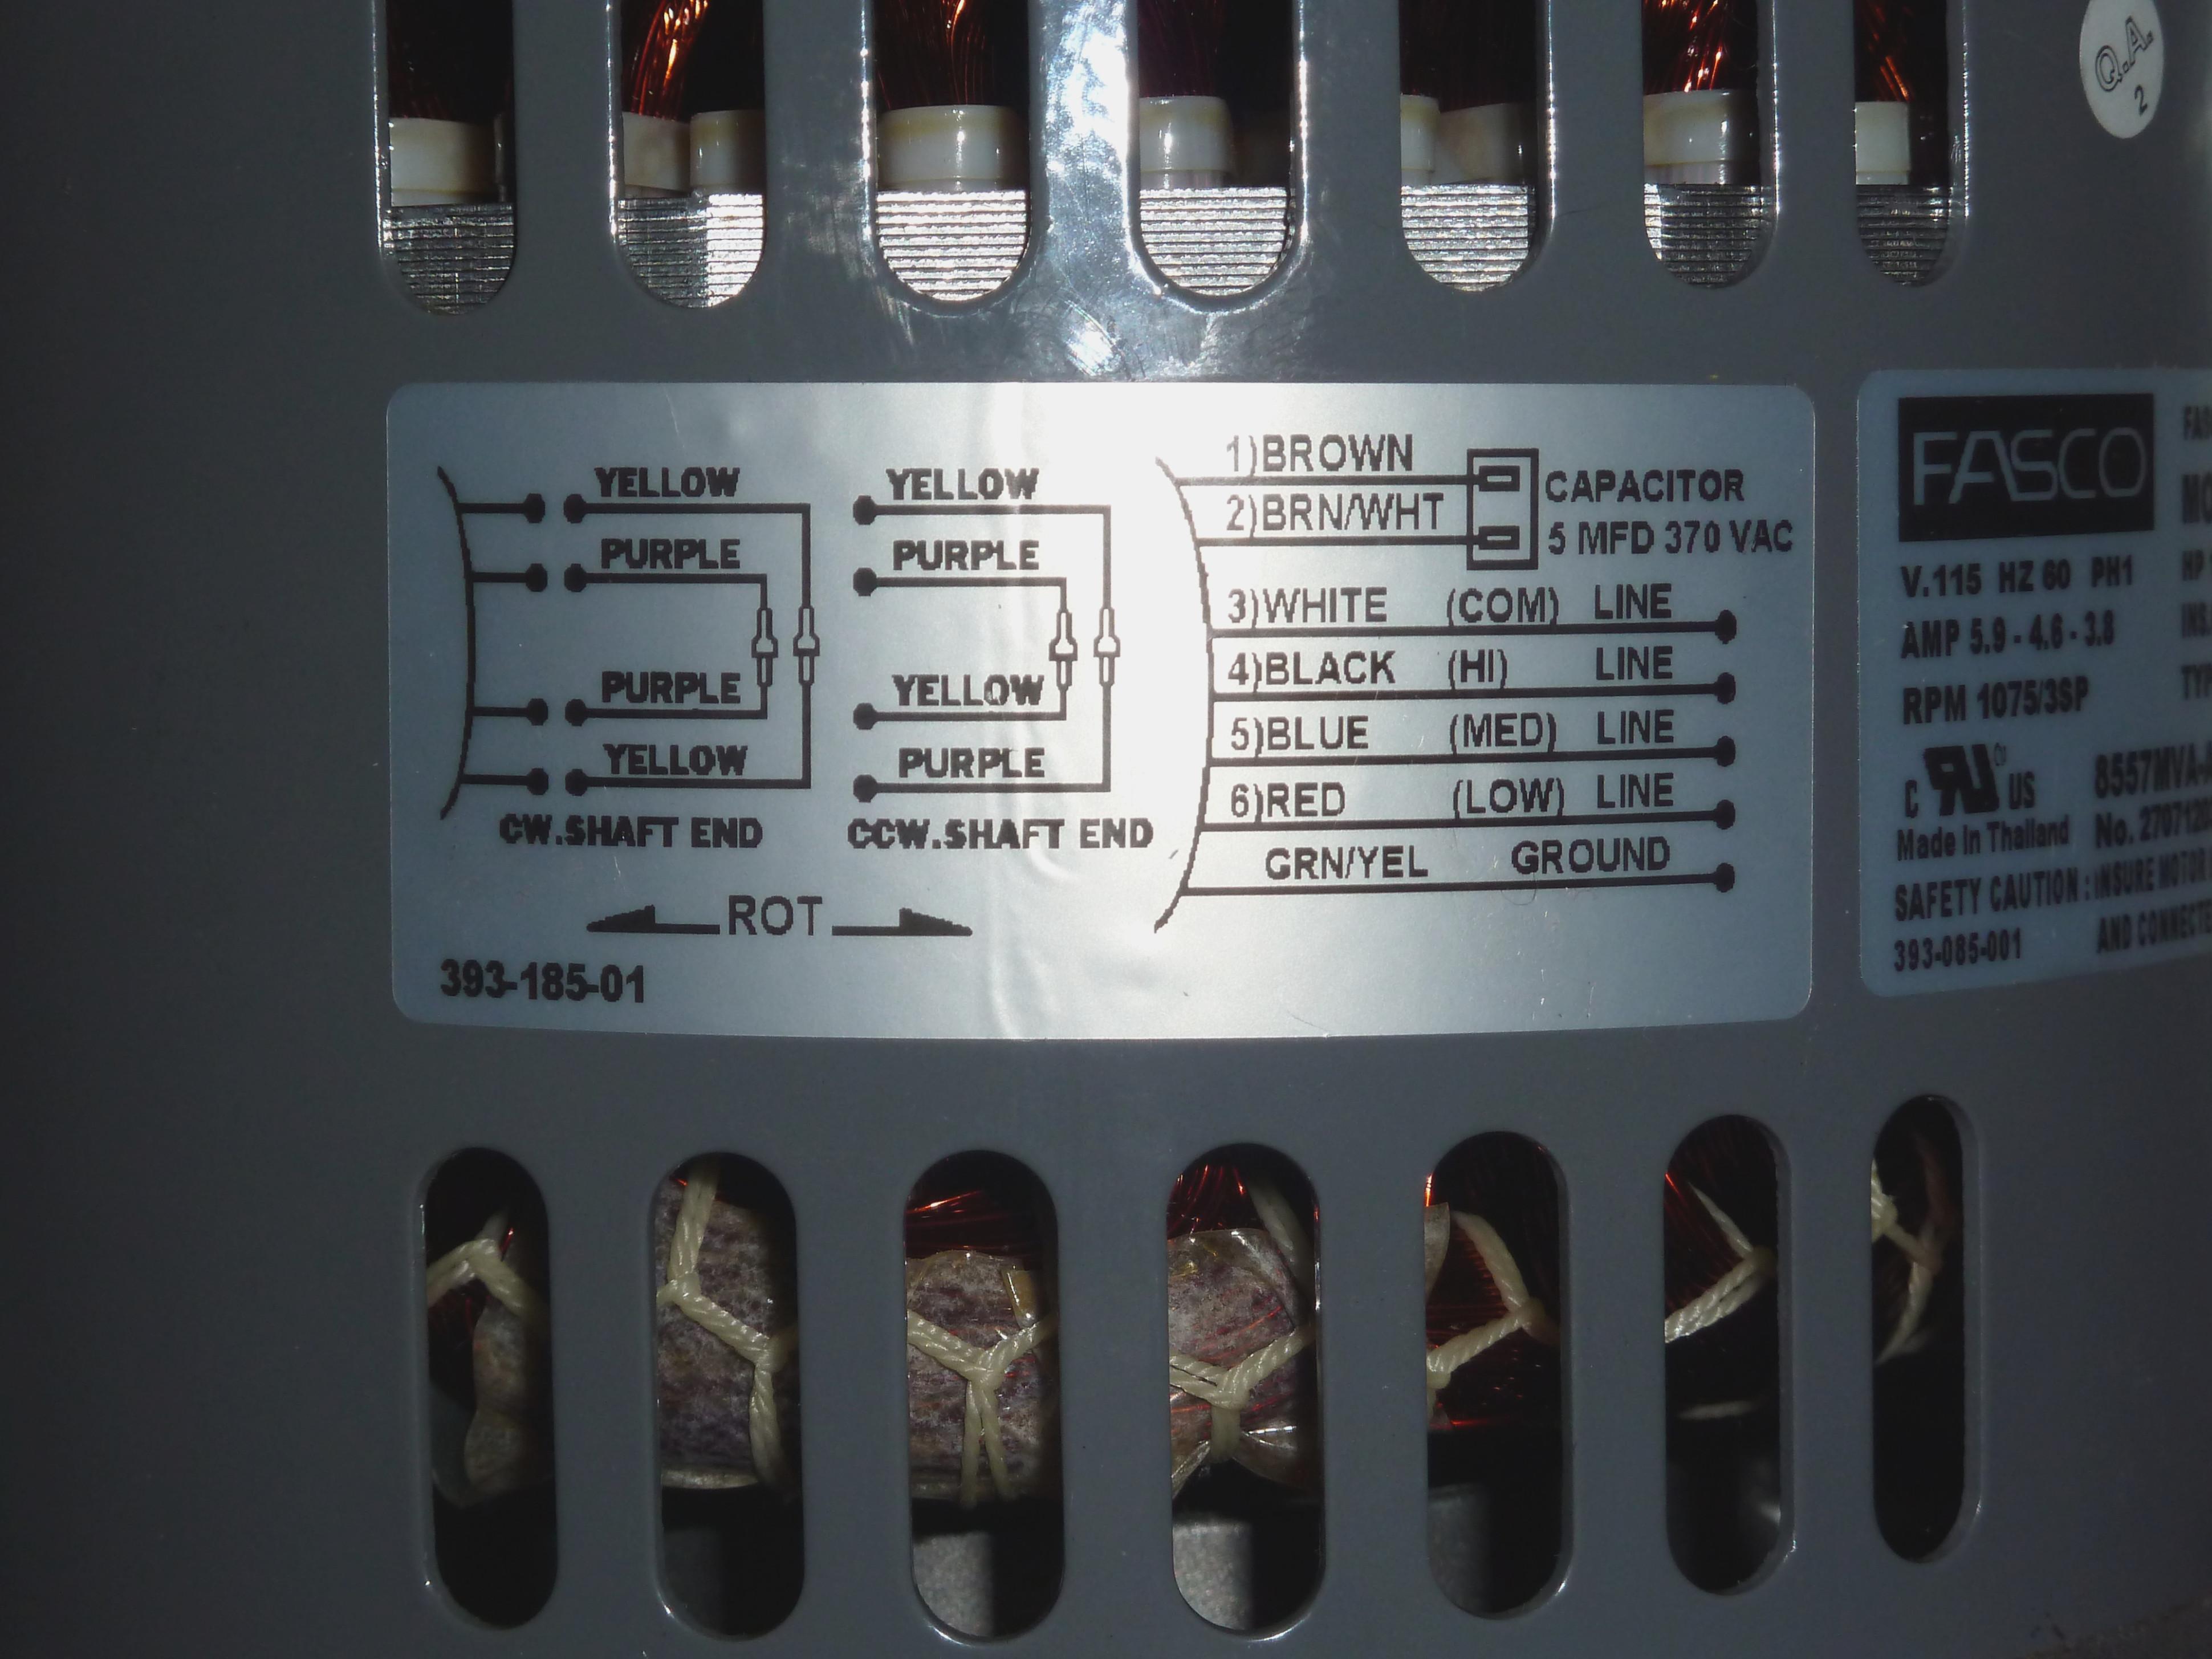 Fasco Blower Wiring Diagram 208v Light Wiring Diagram Begeboy Wiring Diagram Source